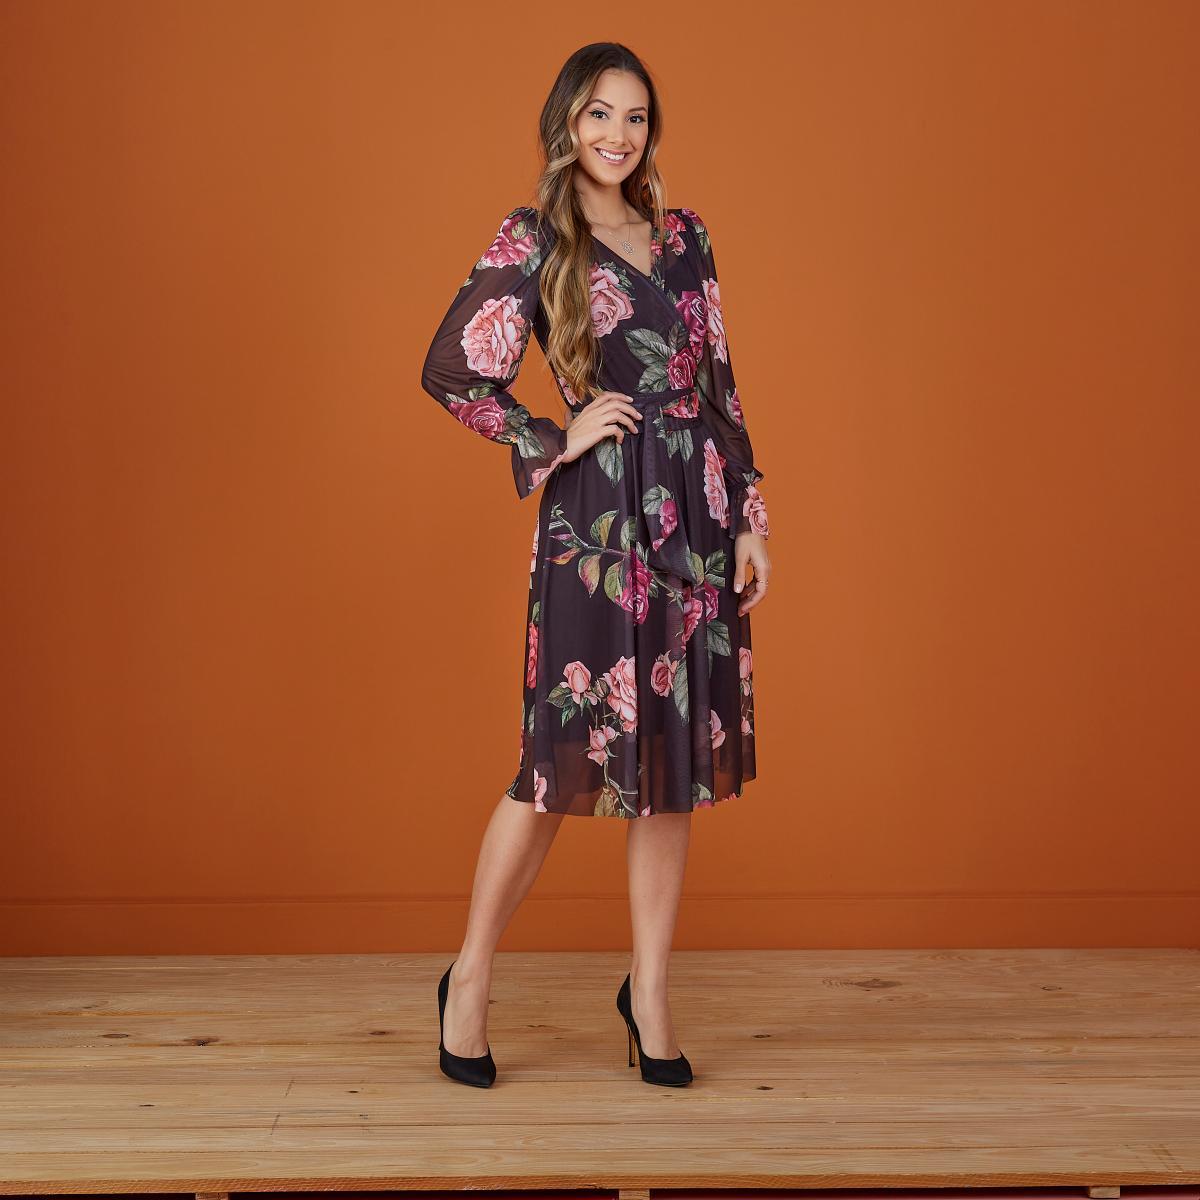 Vestido Cecilia Decote Transpassado, Moda Evangélica - Tatá Martello